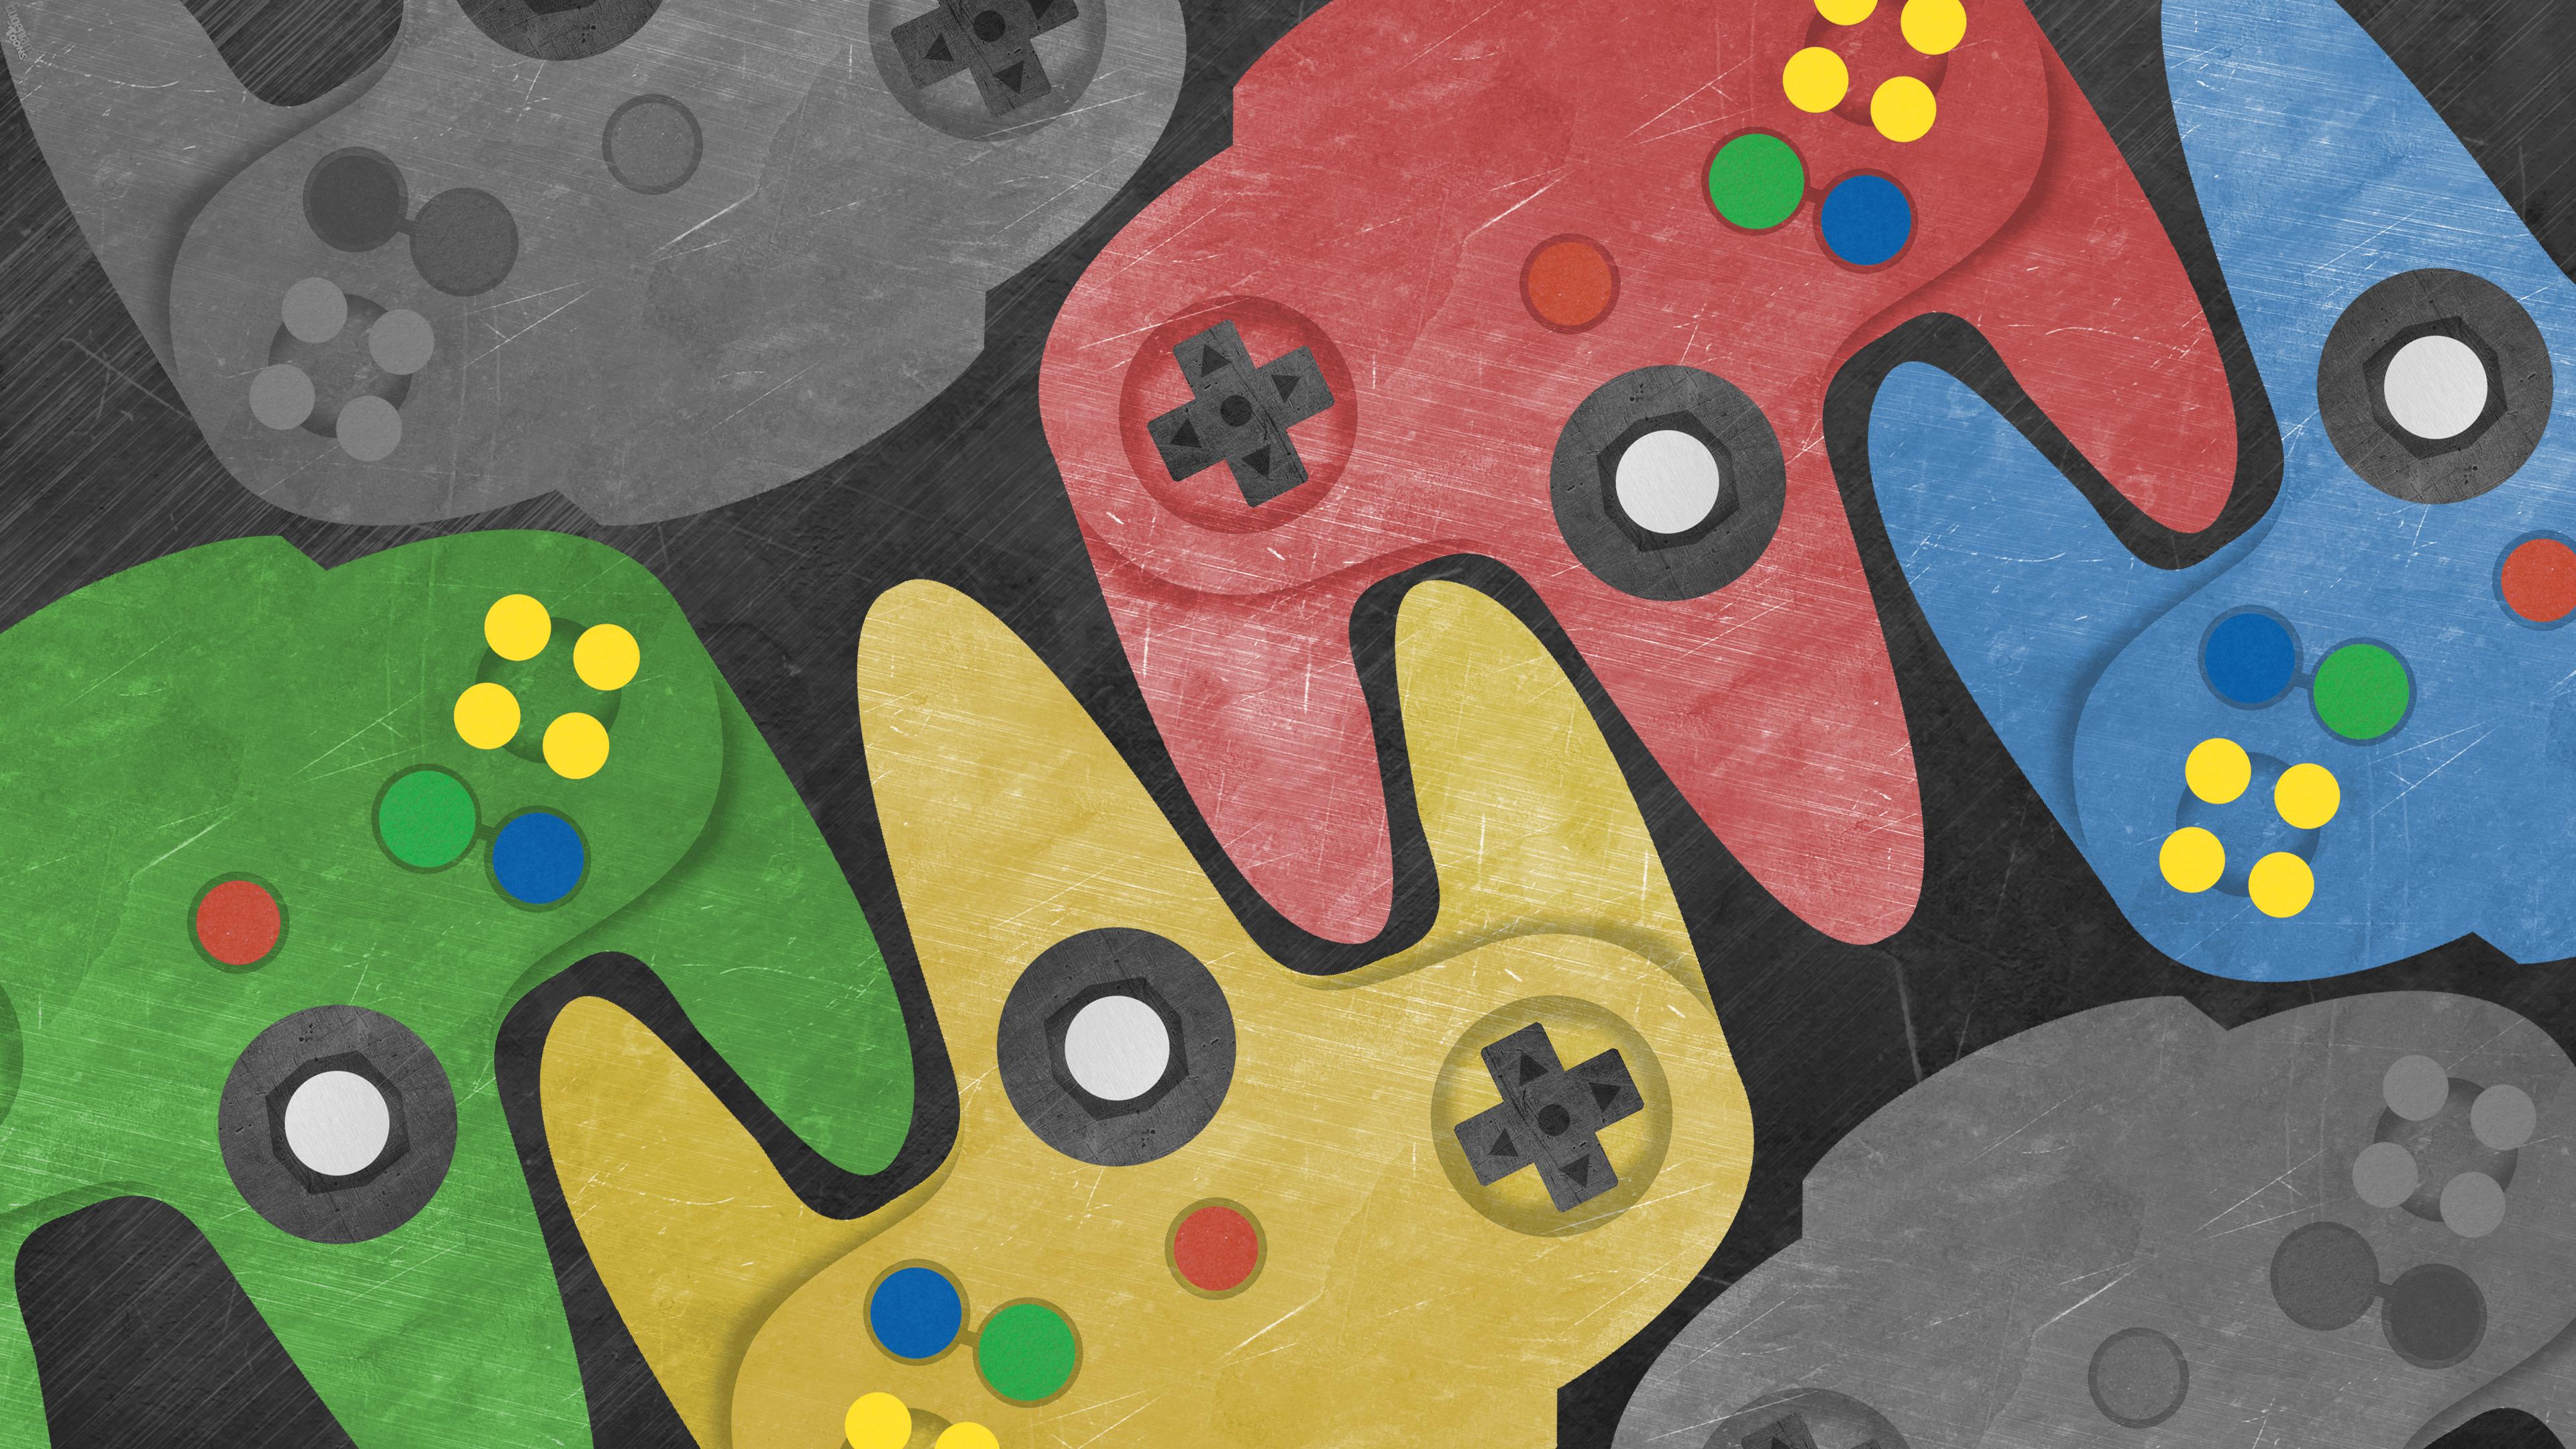 Nintendo 64 Wallpapers - Wallpaper Cave